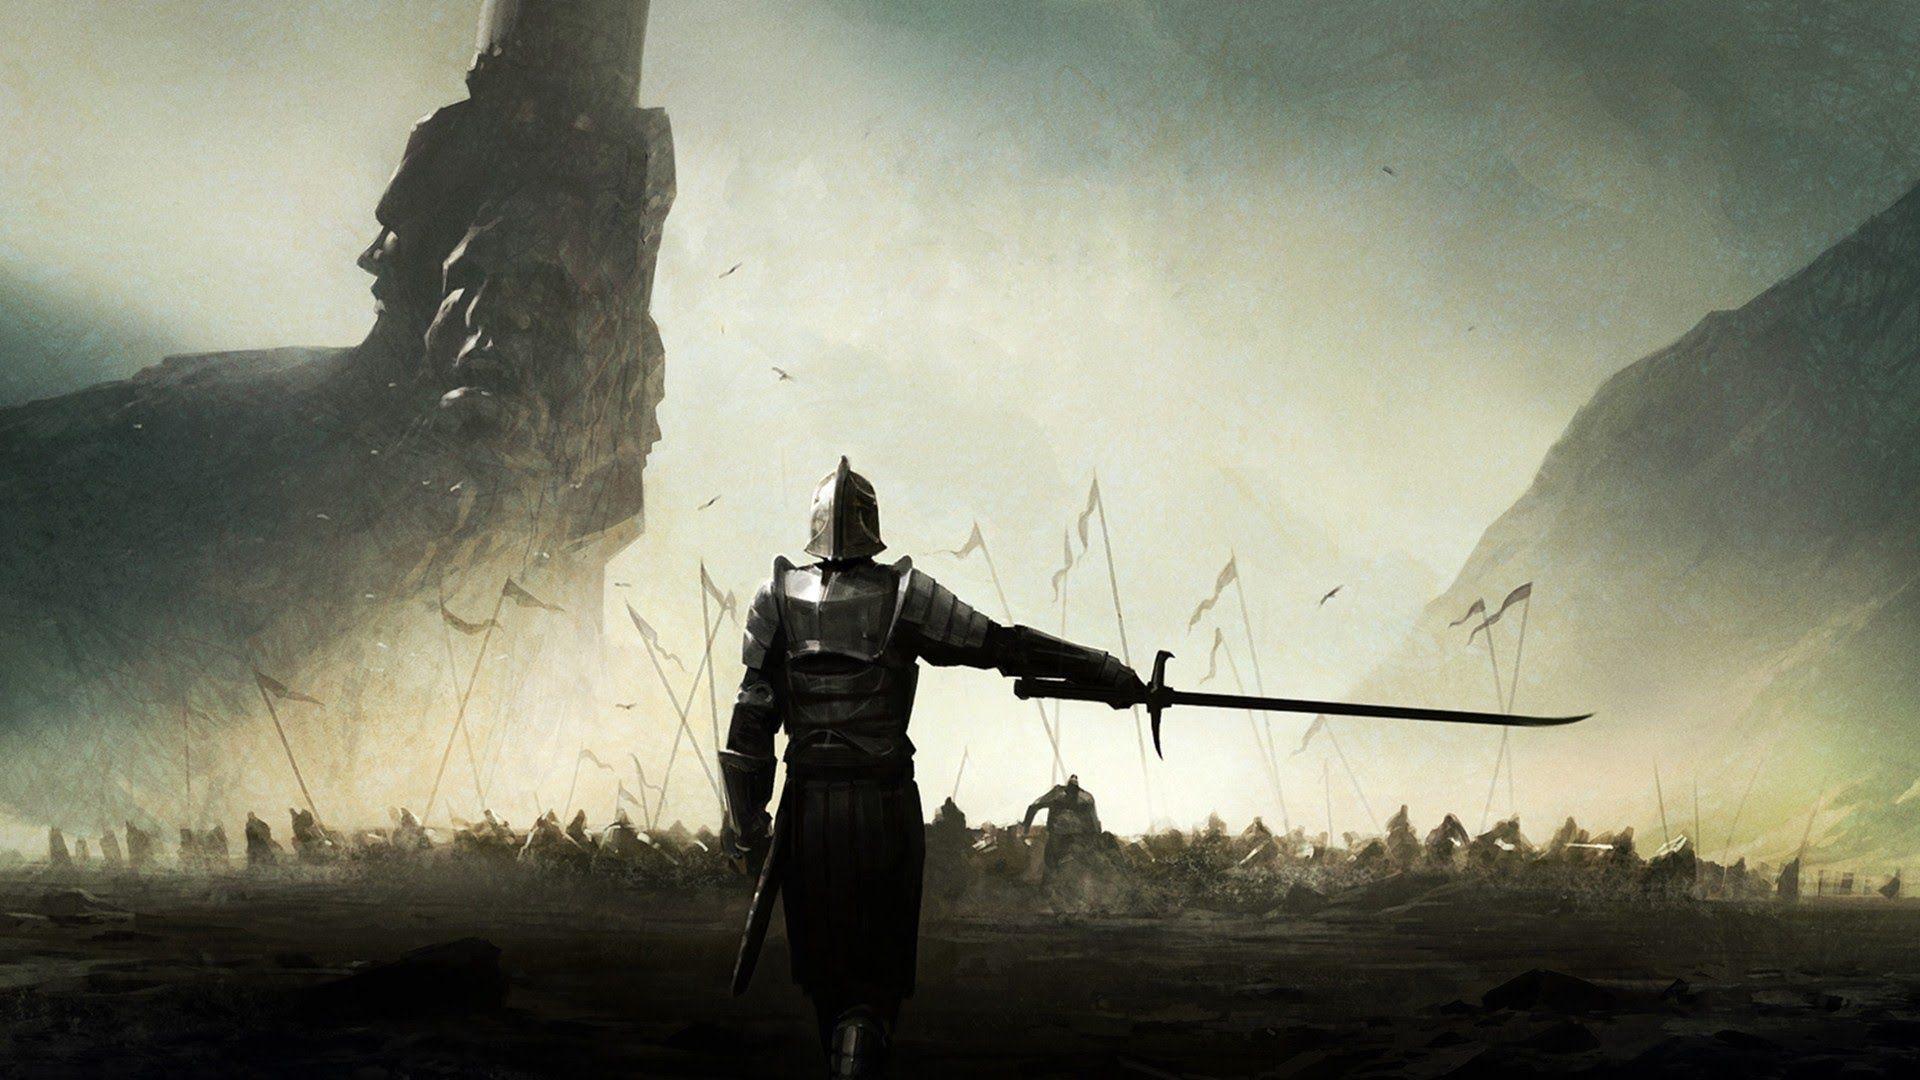 Epic Battle Music Vi Hd Inspirujące Lekcje życiowe I